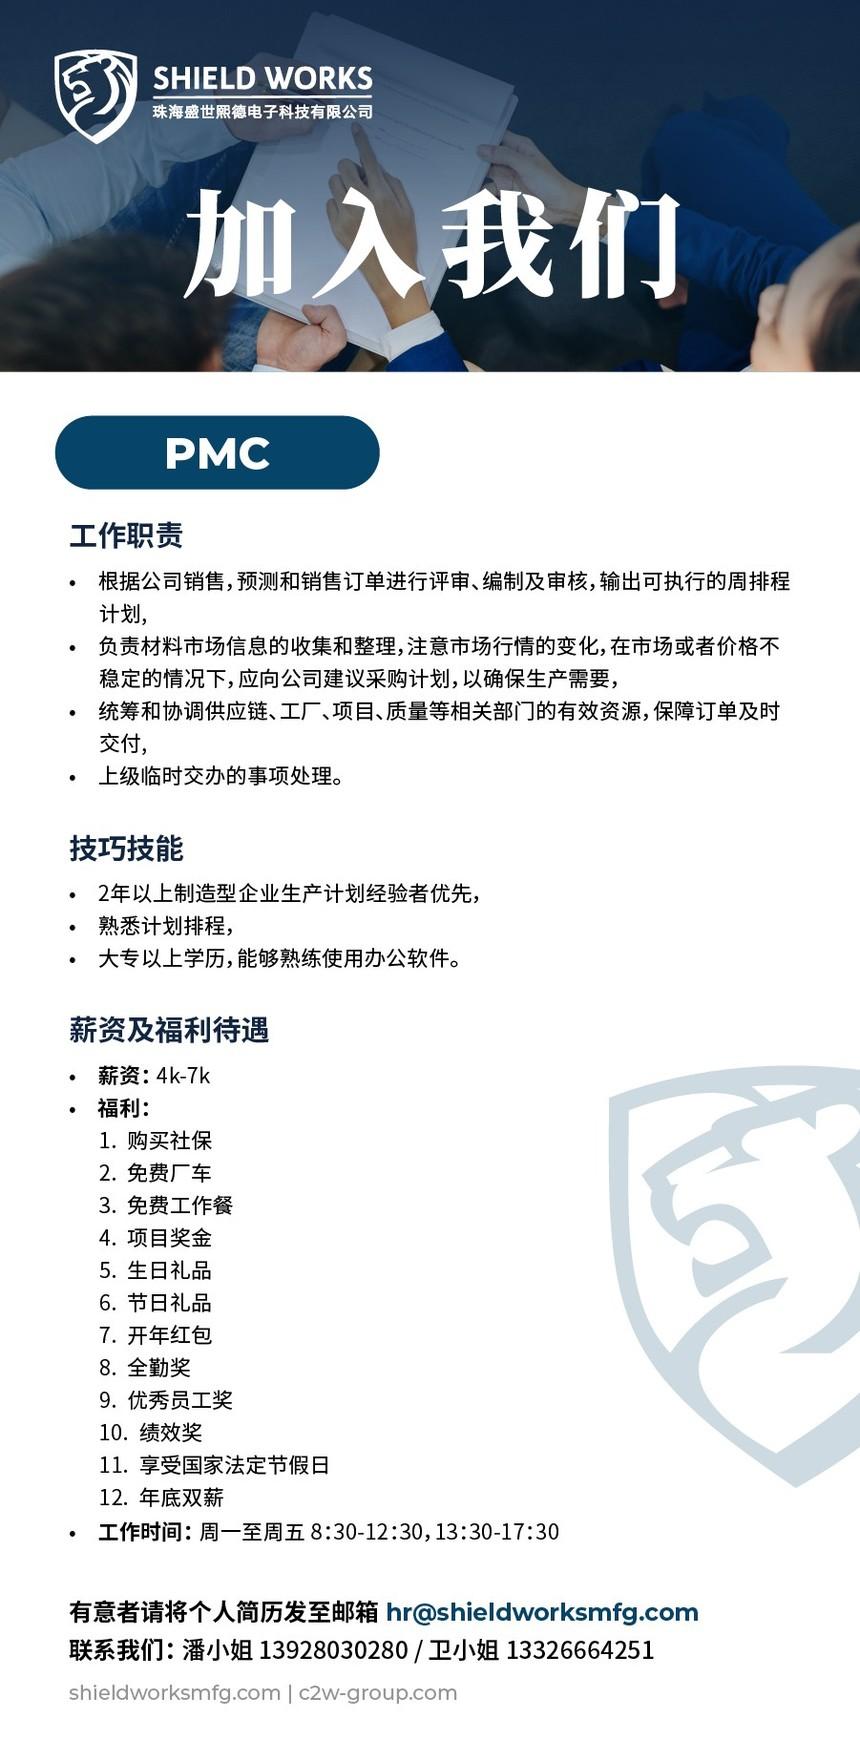 SW - PMC.jpg